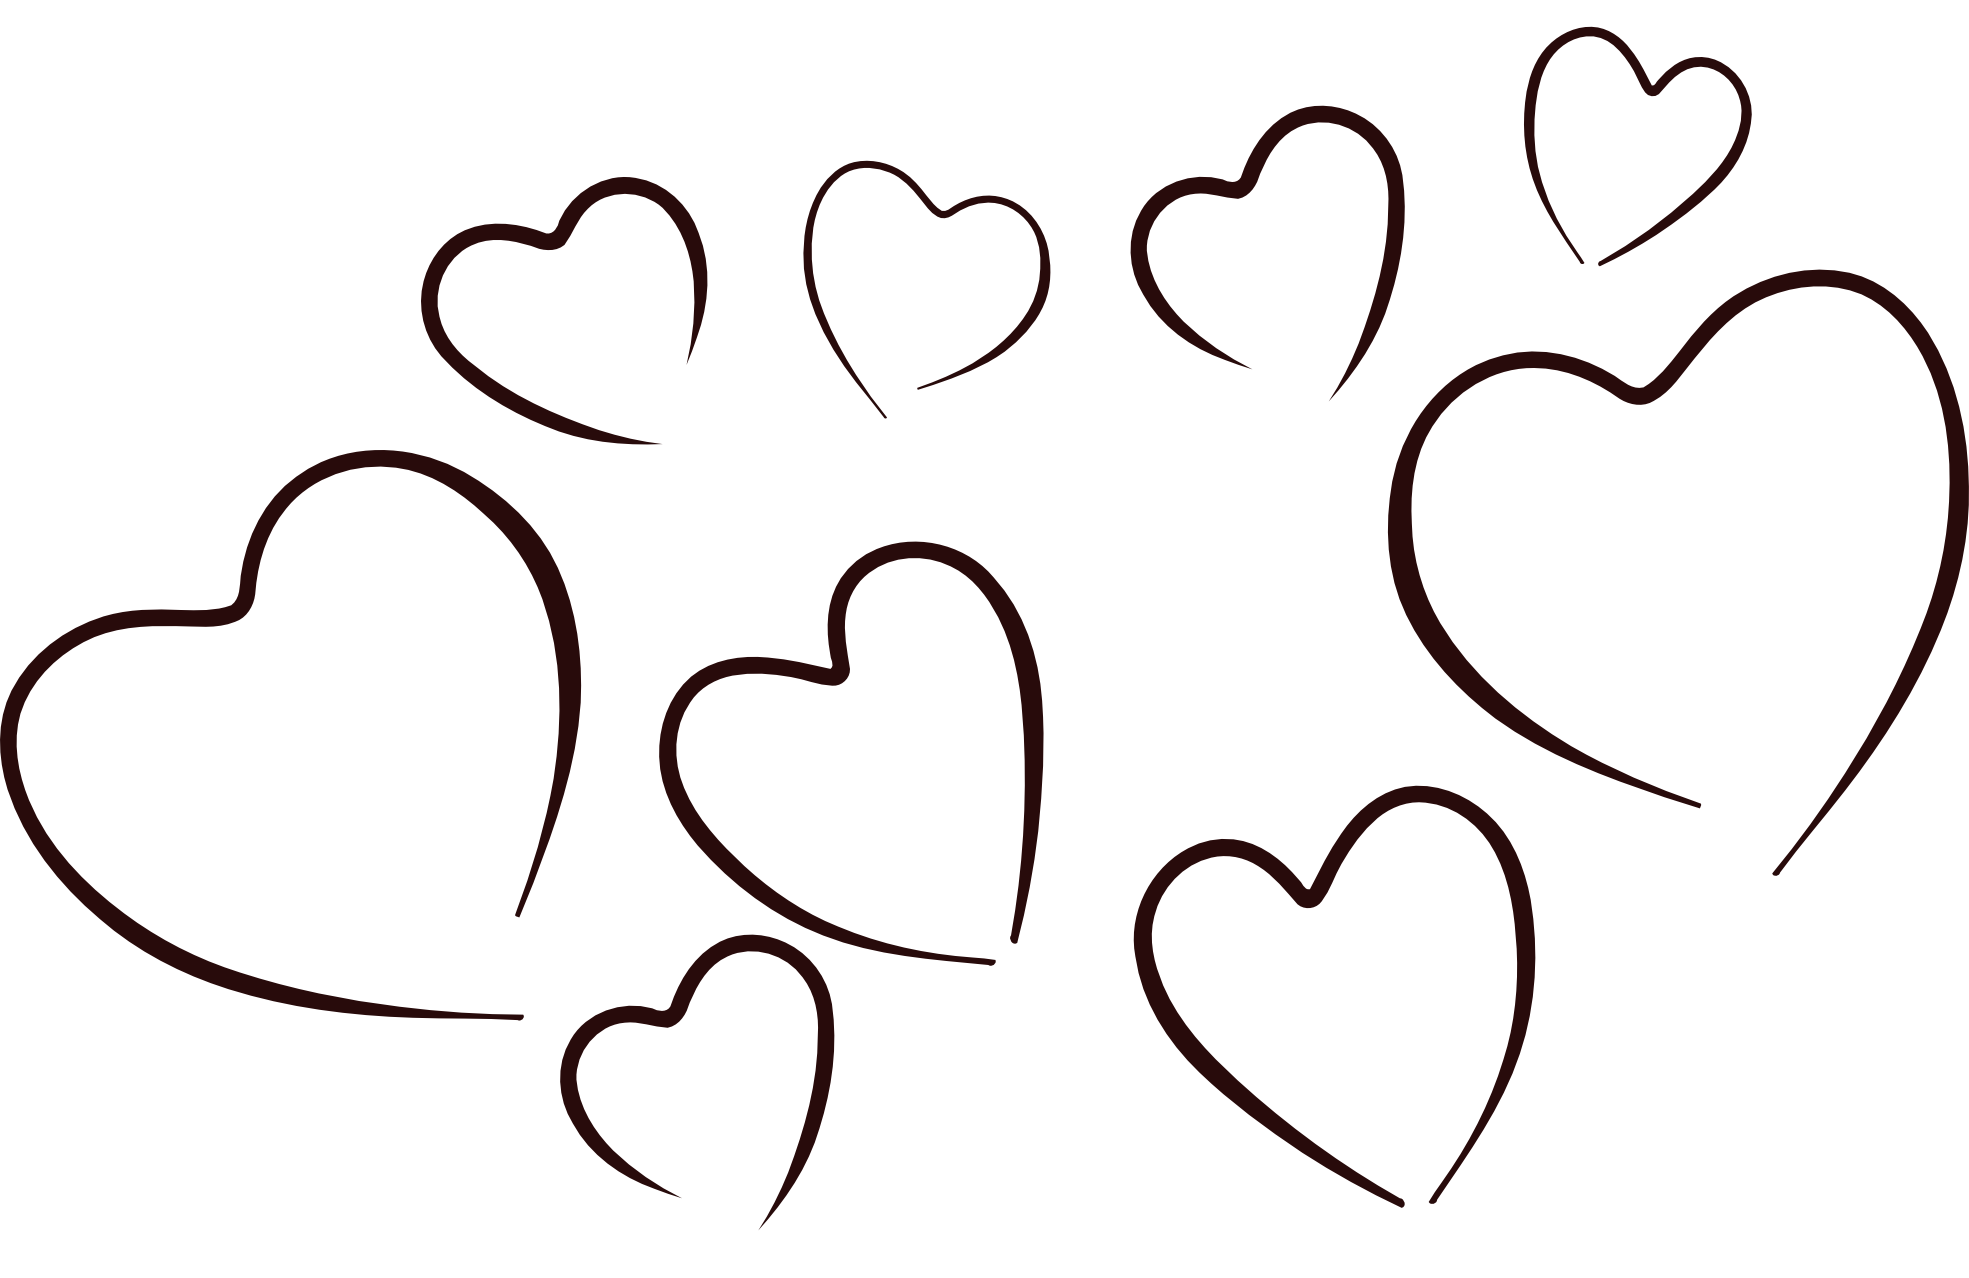 Clip Art Heart Black And White Clipart Panda Free Clipart Images Black And White Heart Clipart Black And White Clip Art